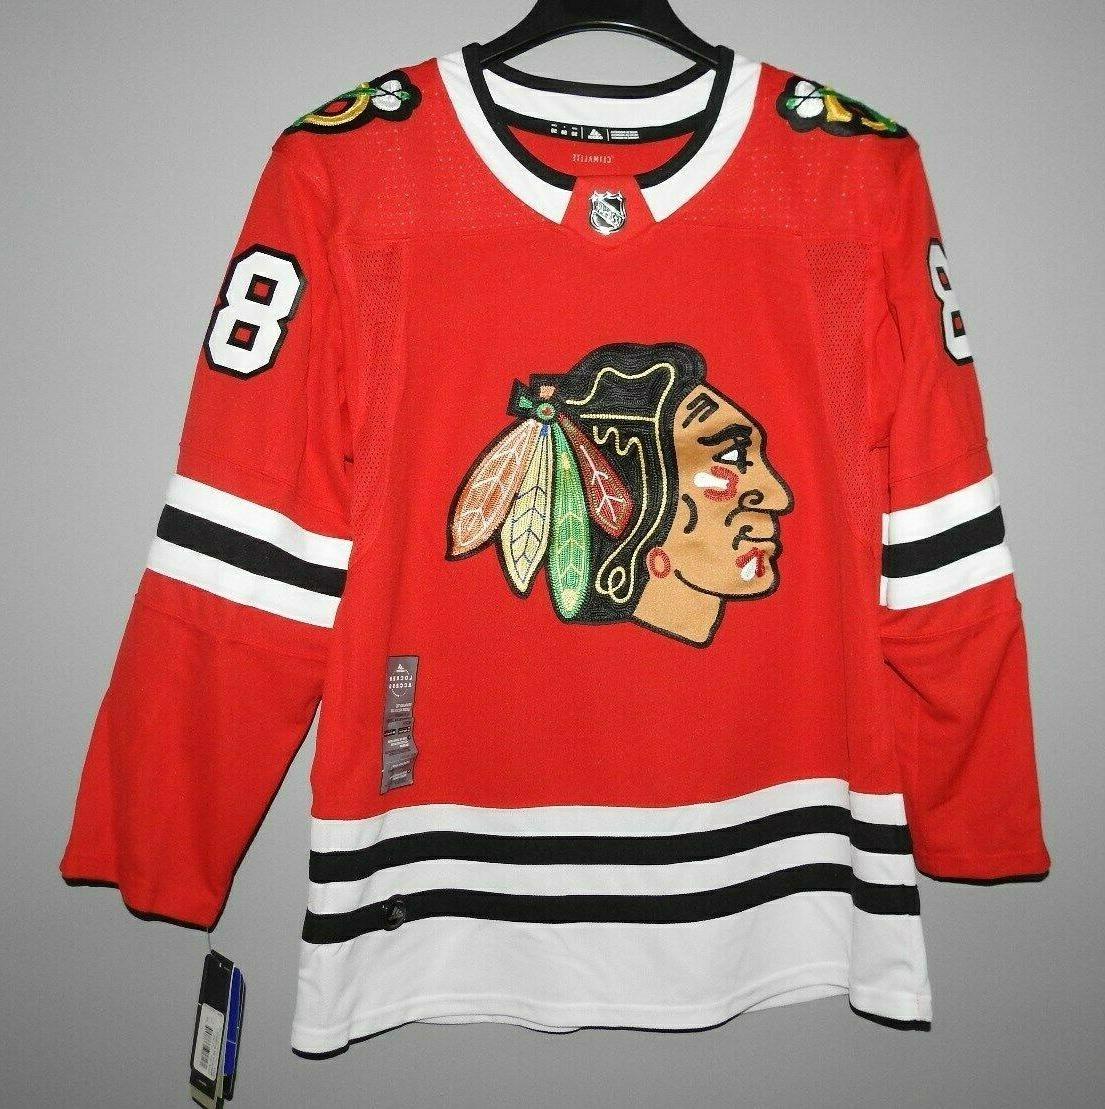 Authentic NHL Blackhawks #88 Jersey New